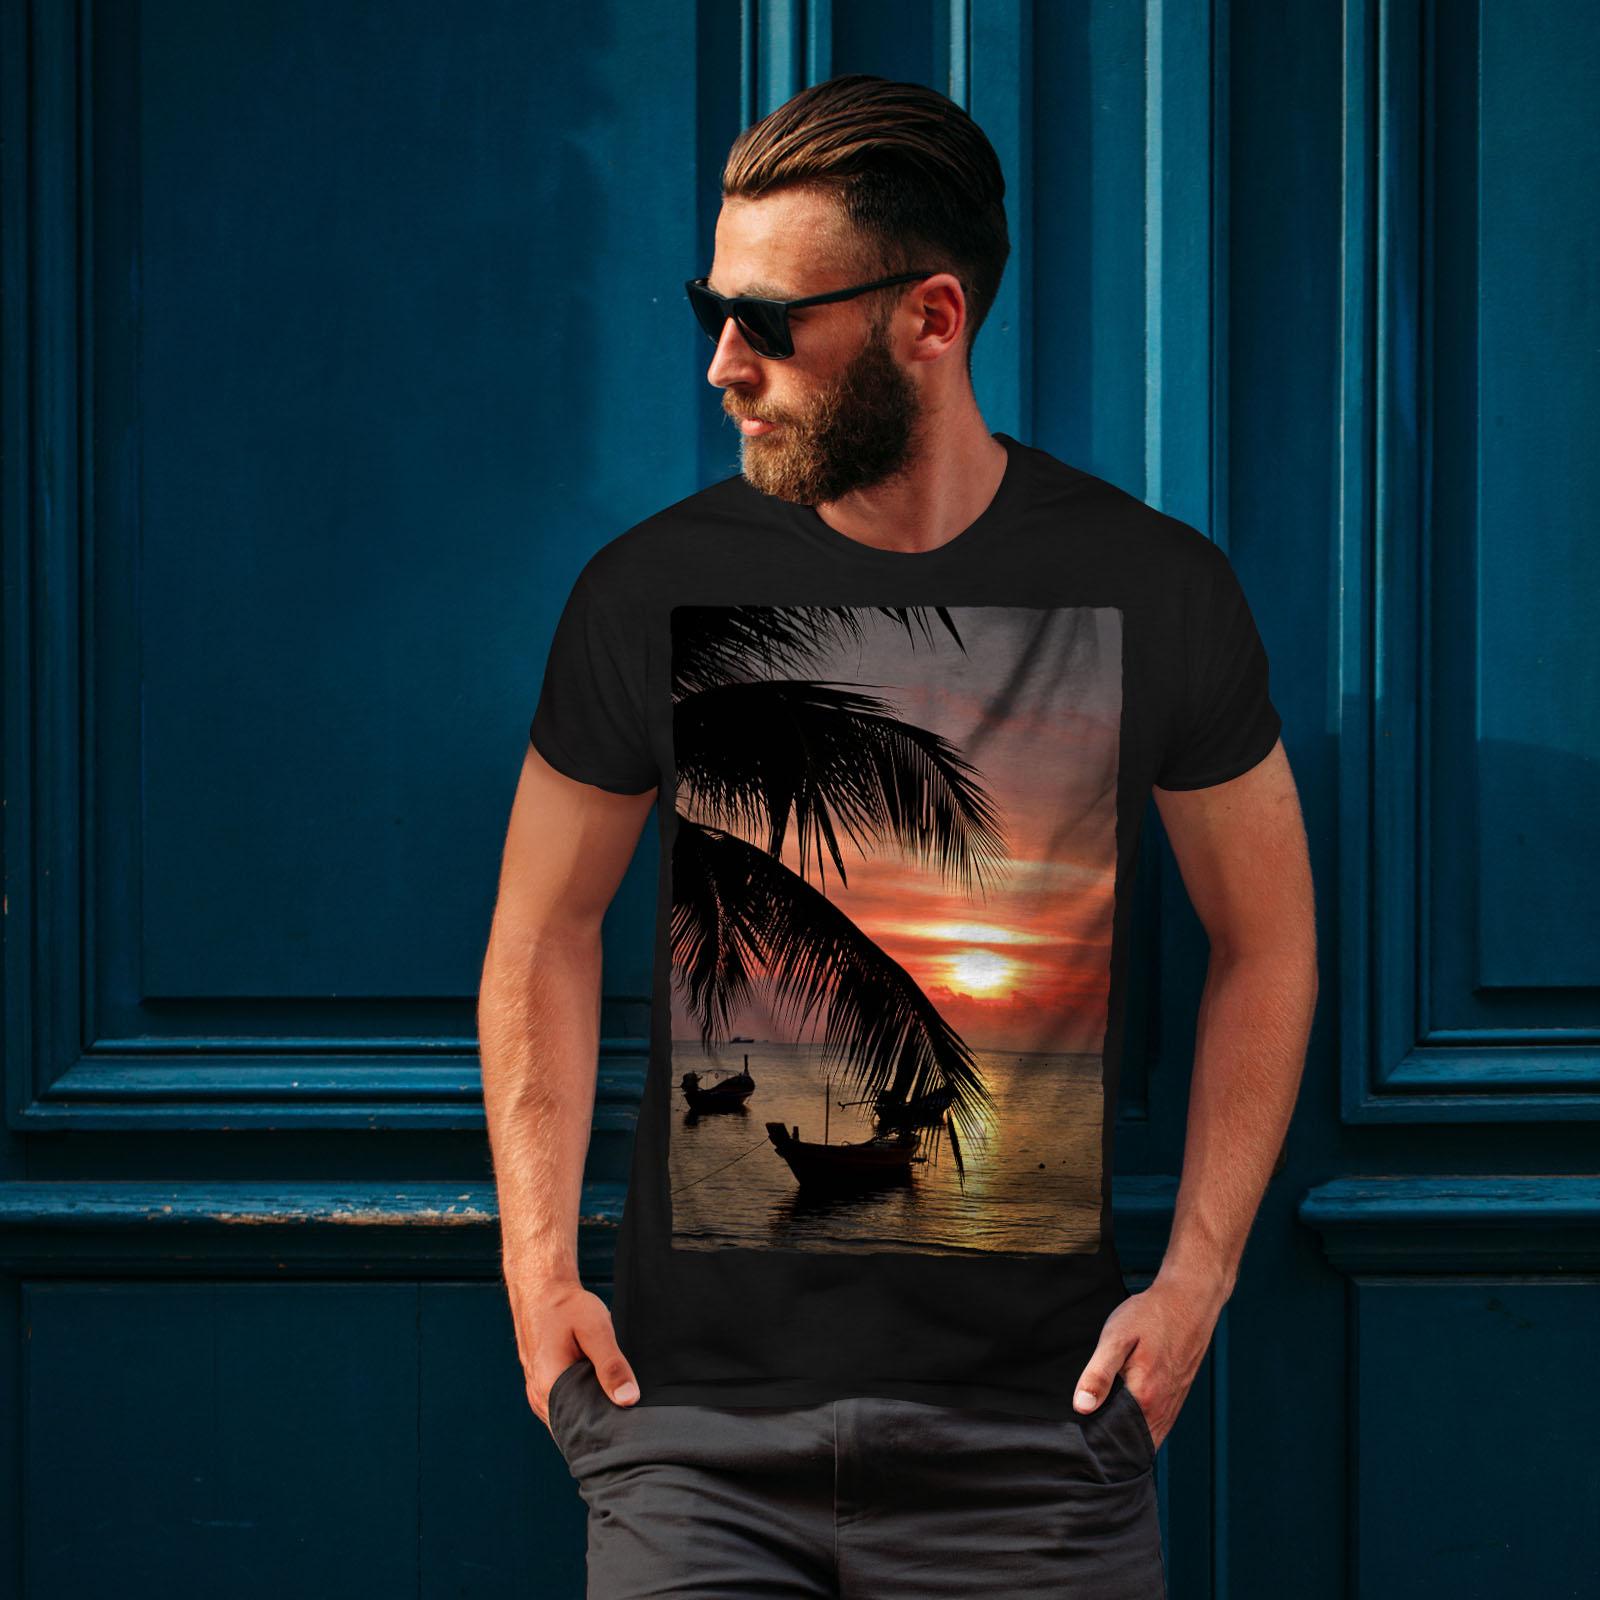 Wellcoda-Sunset-Palm-Tree-Mens-T-shirt-Ocean-Beach-Graphic-Design-Printed-Tee thumbnail 4